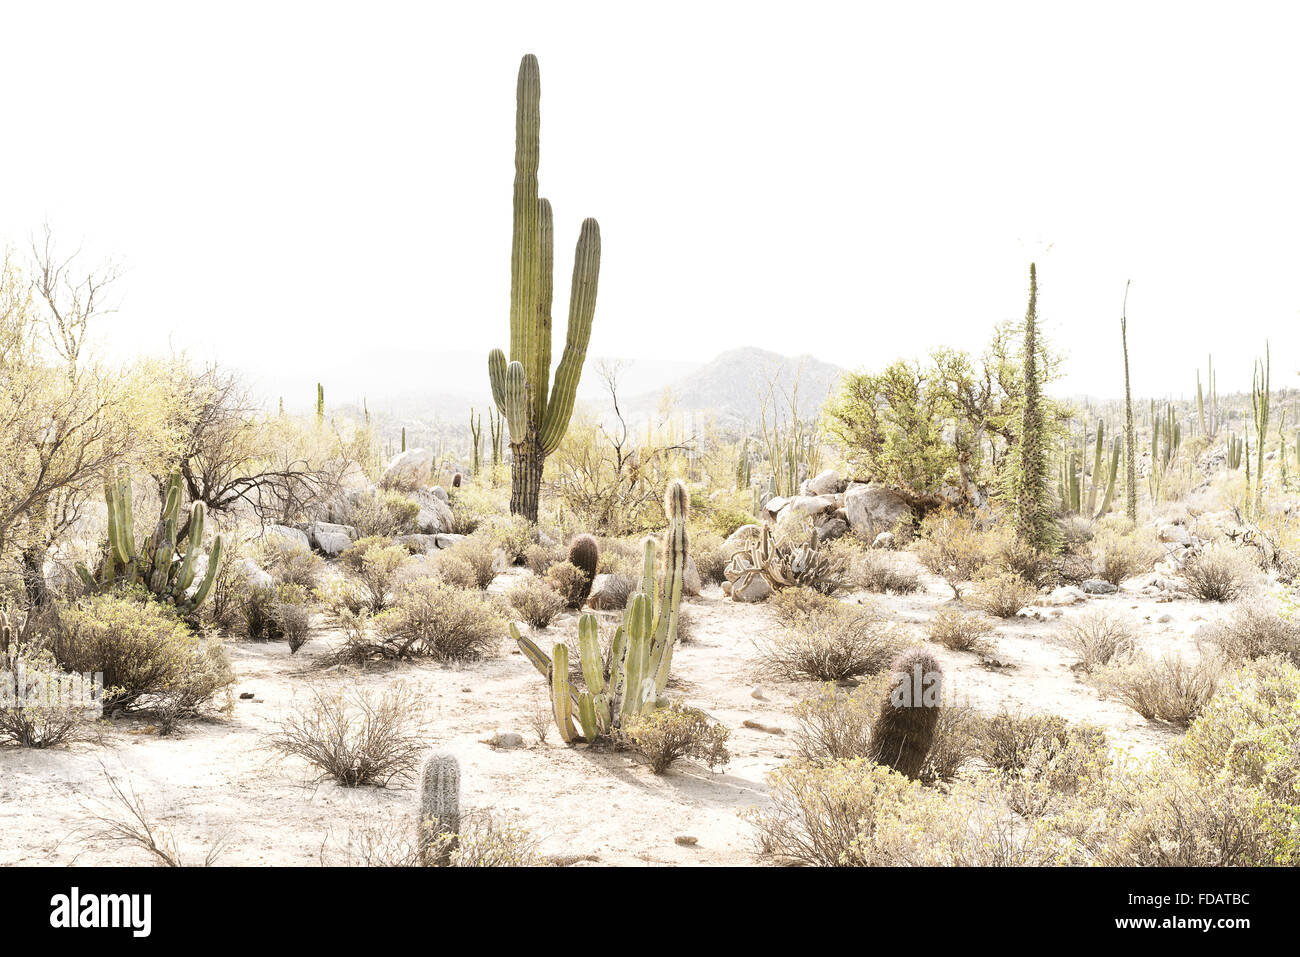 Wüste-Szene in Baja California, Mexiko Stockbild